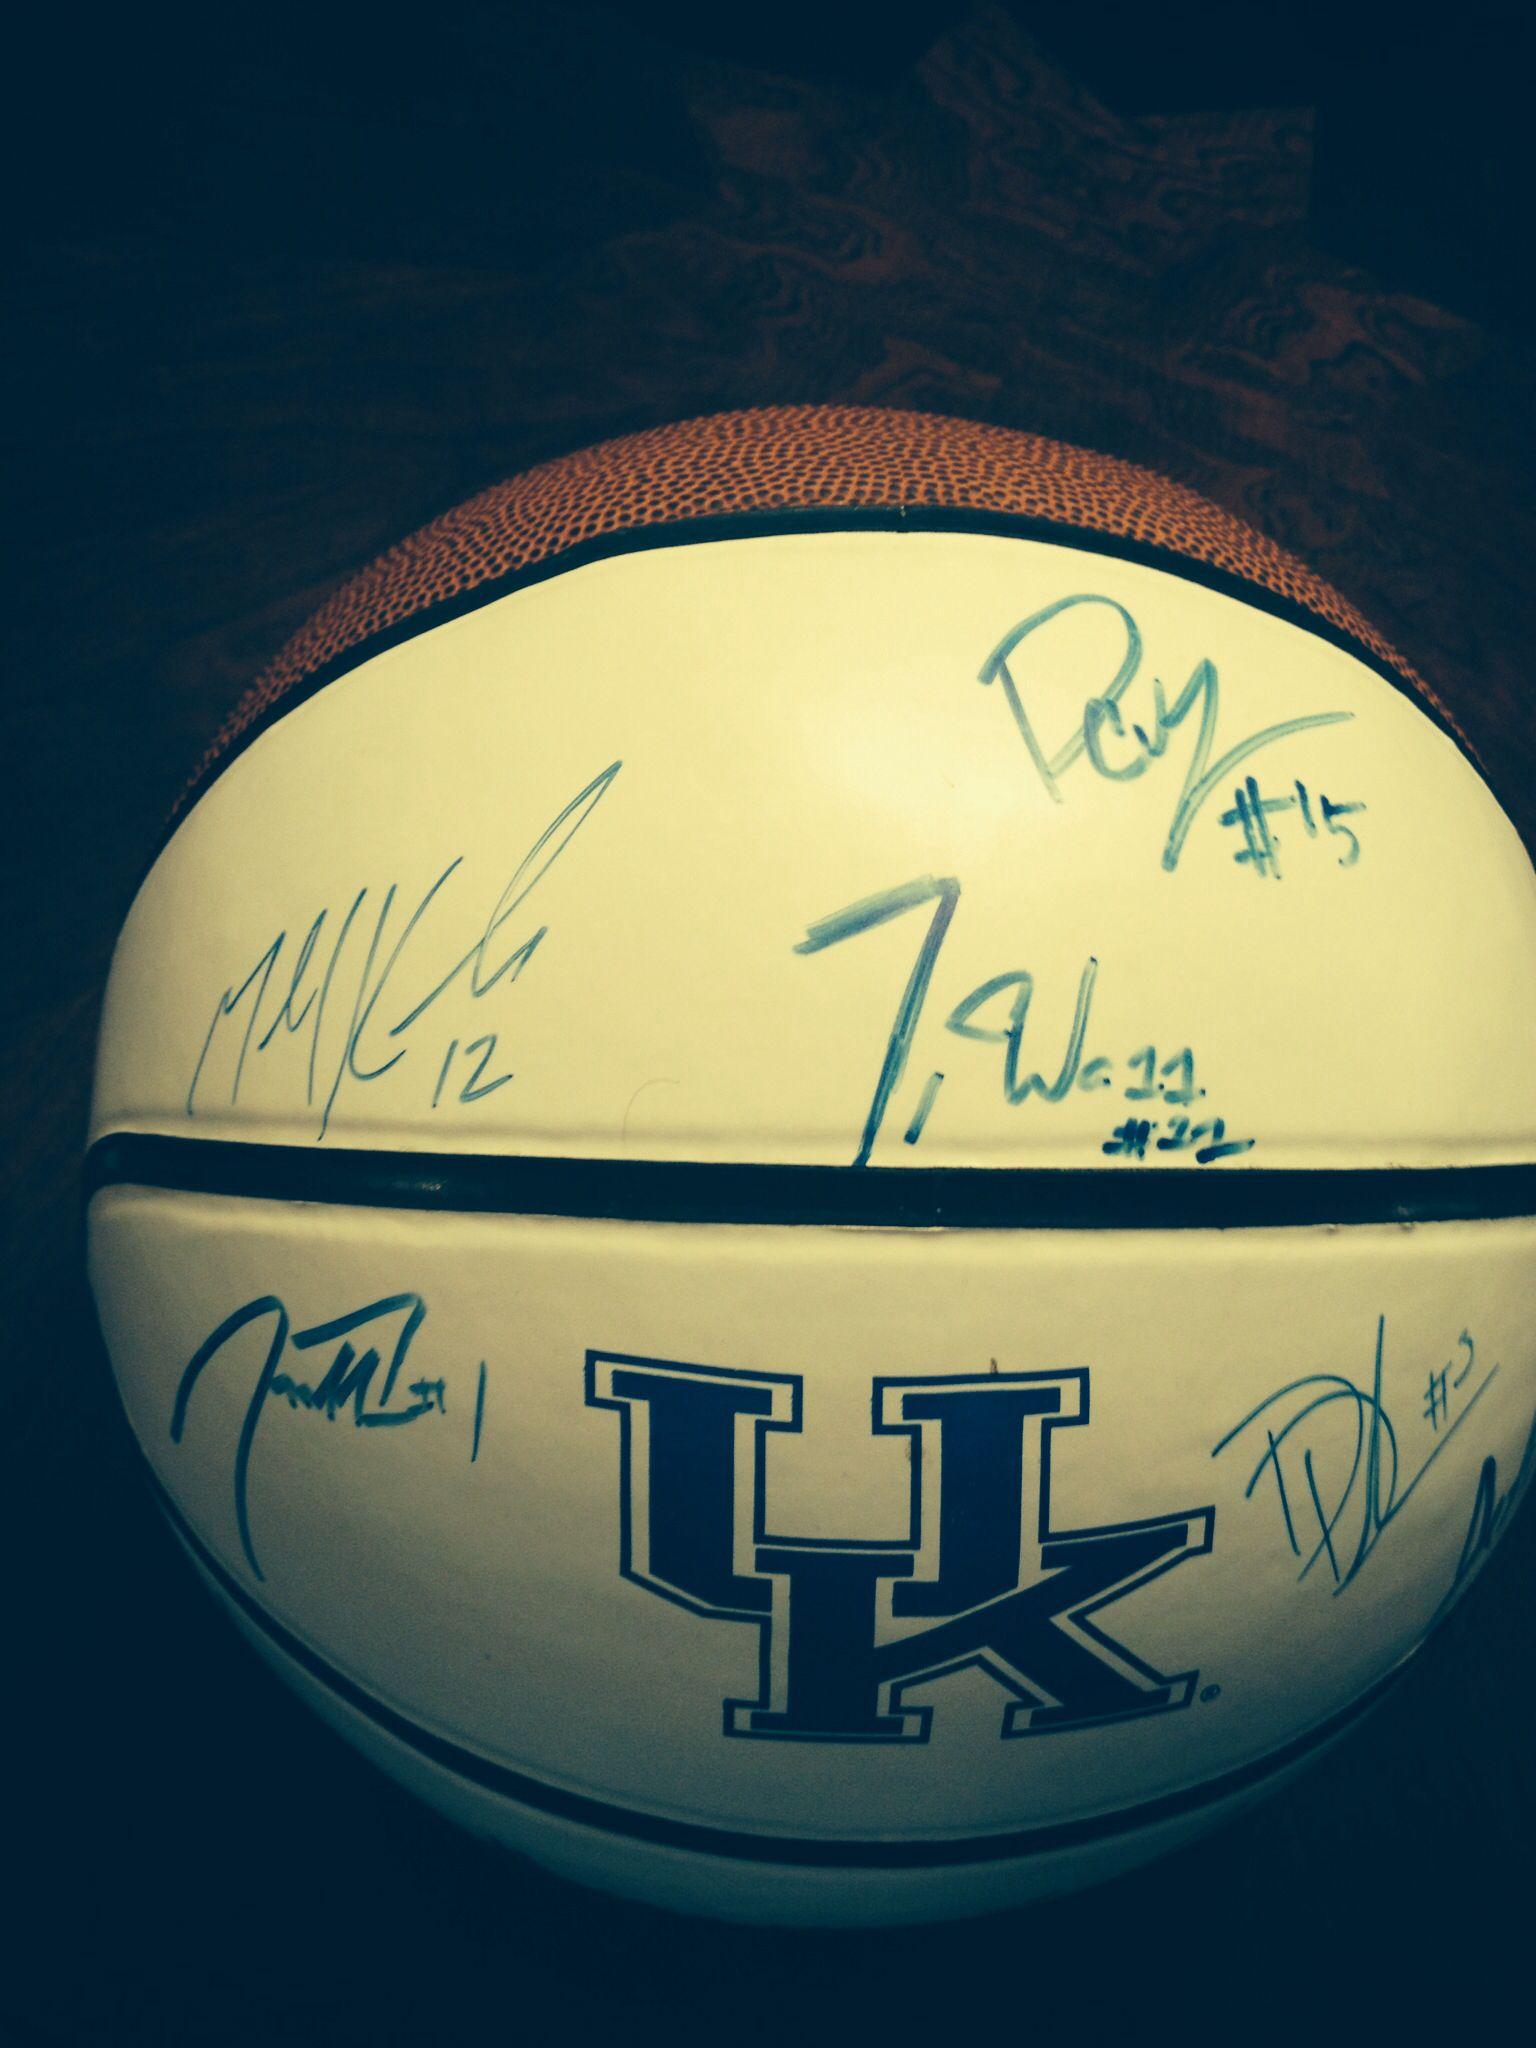 2010 Team Signature Ball (every player)